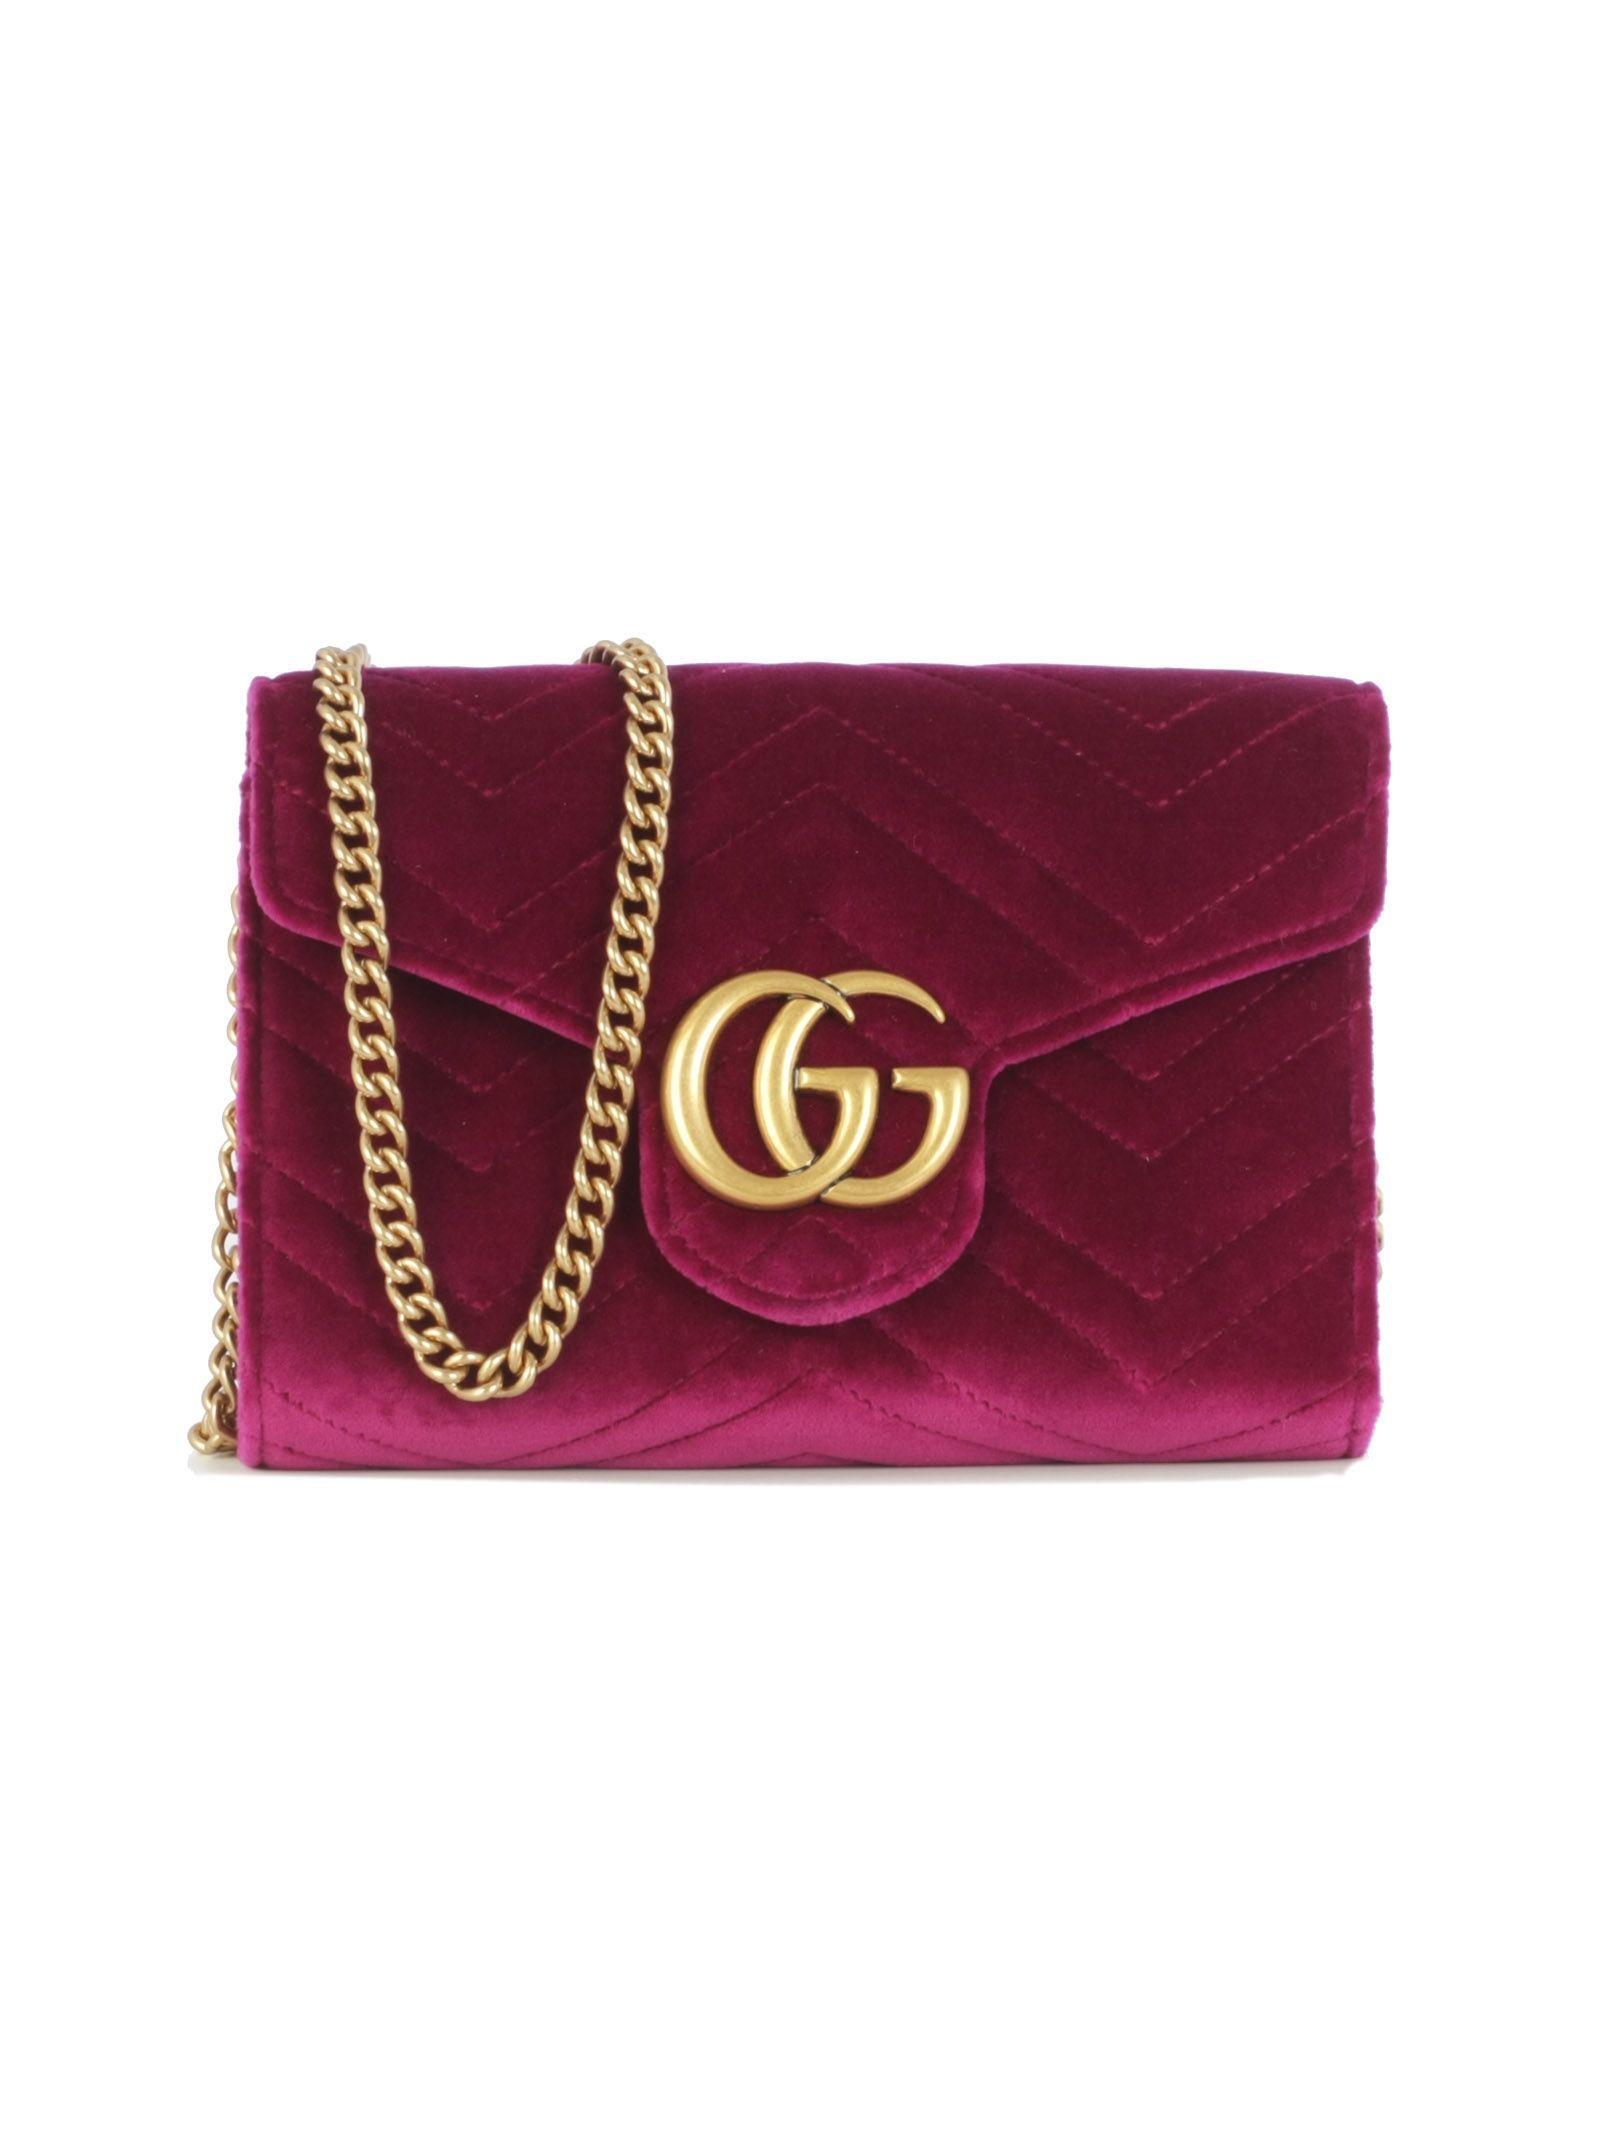 6cd6614ba20 GUCCI VELVET GG MARMONT CATENA. #gucci #bags #velvet   Gucci in 2019 ...